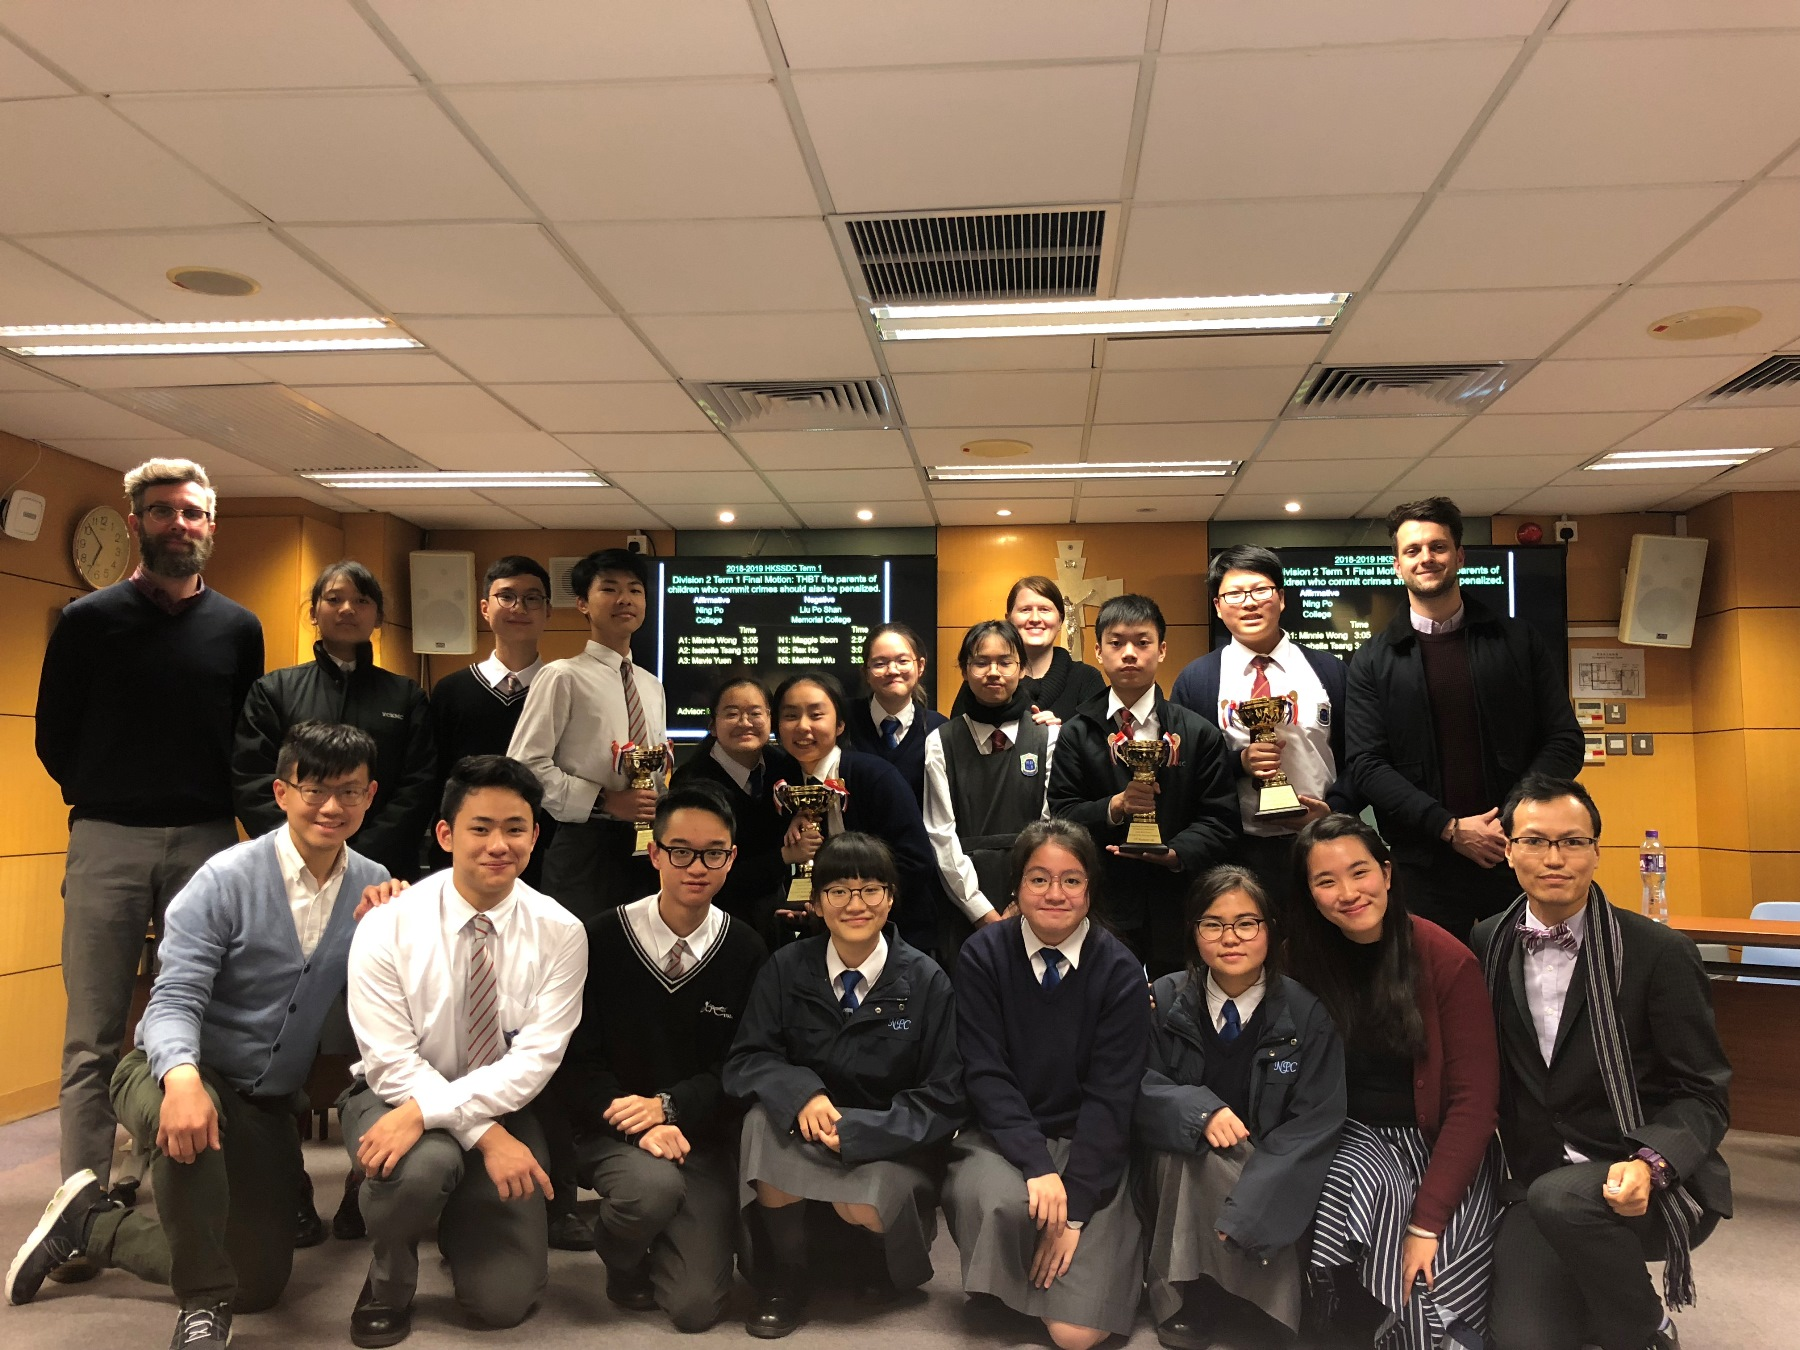 http://npc.edu.hk/sites/default/files/_011819_term_1_final_kln_ntw_division_ii_-_3_schools.jpg